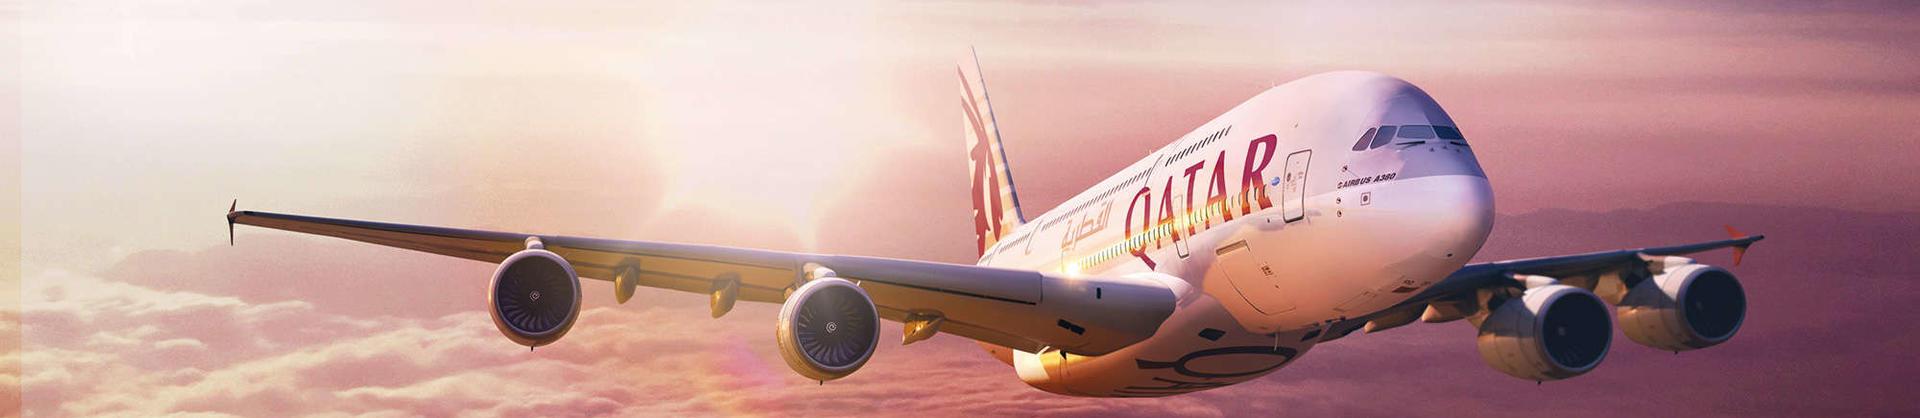 Qatar Airways A380 aircraft in the sky